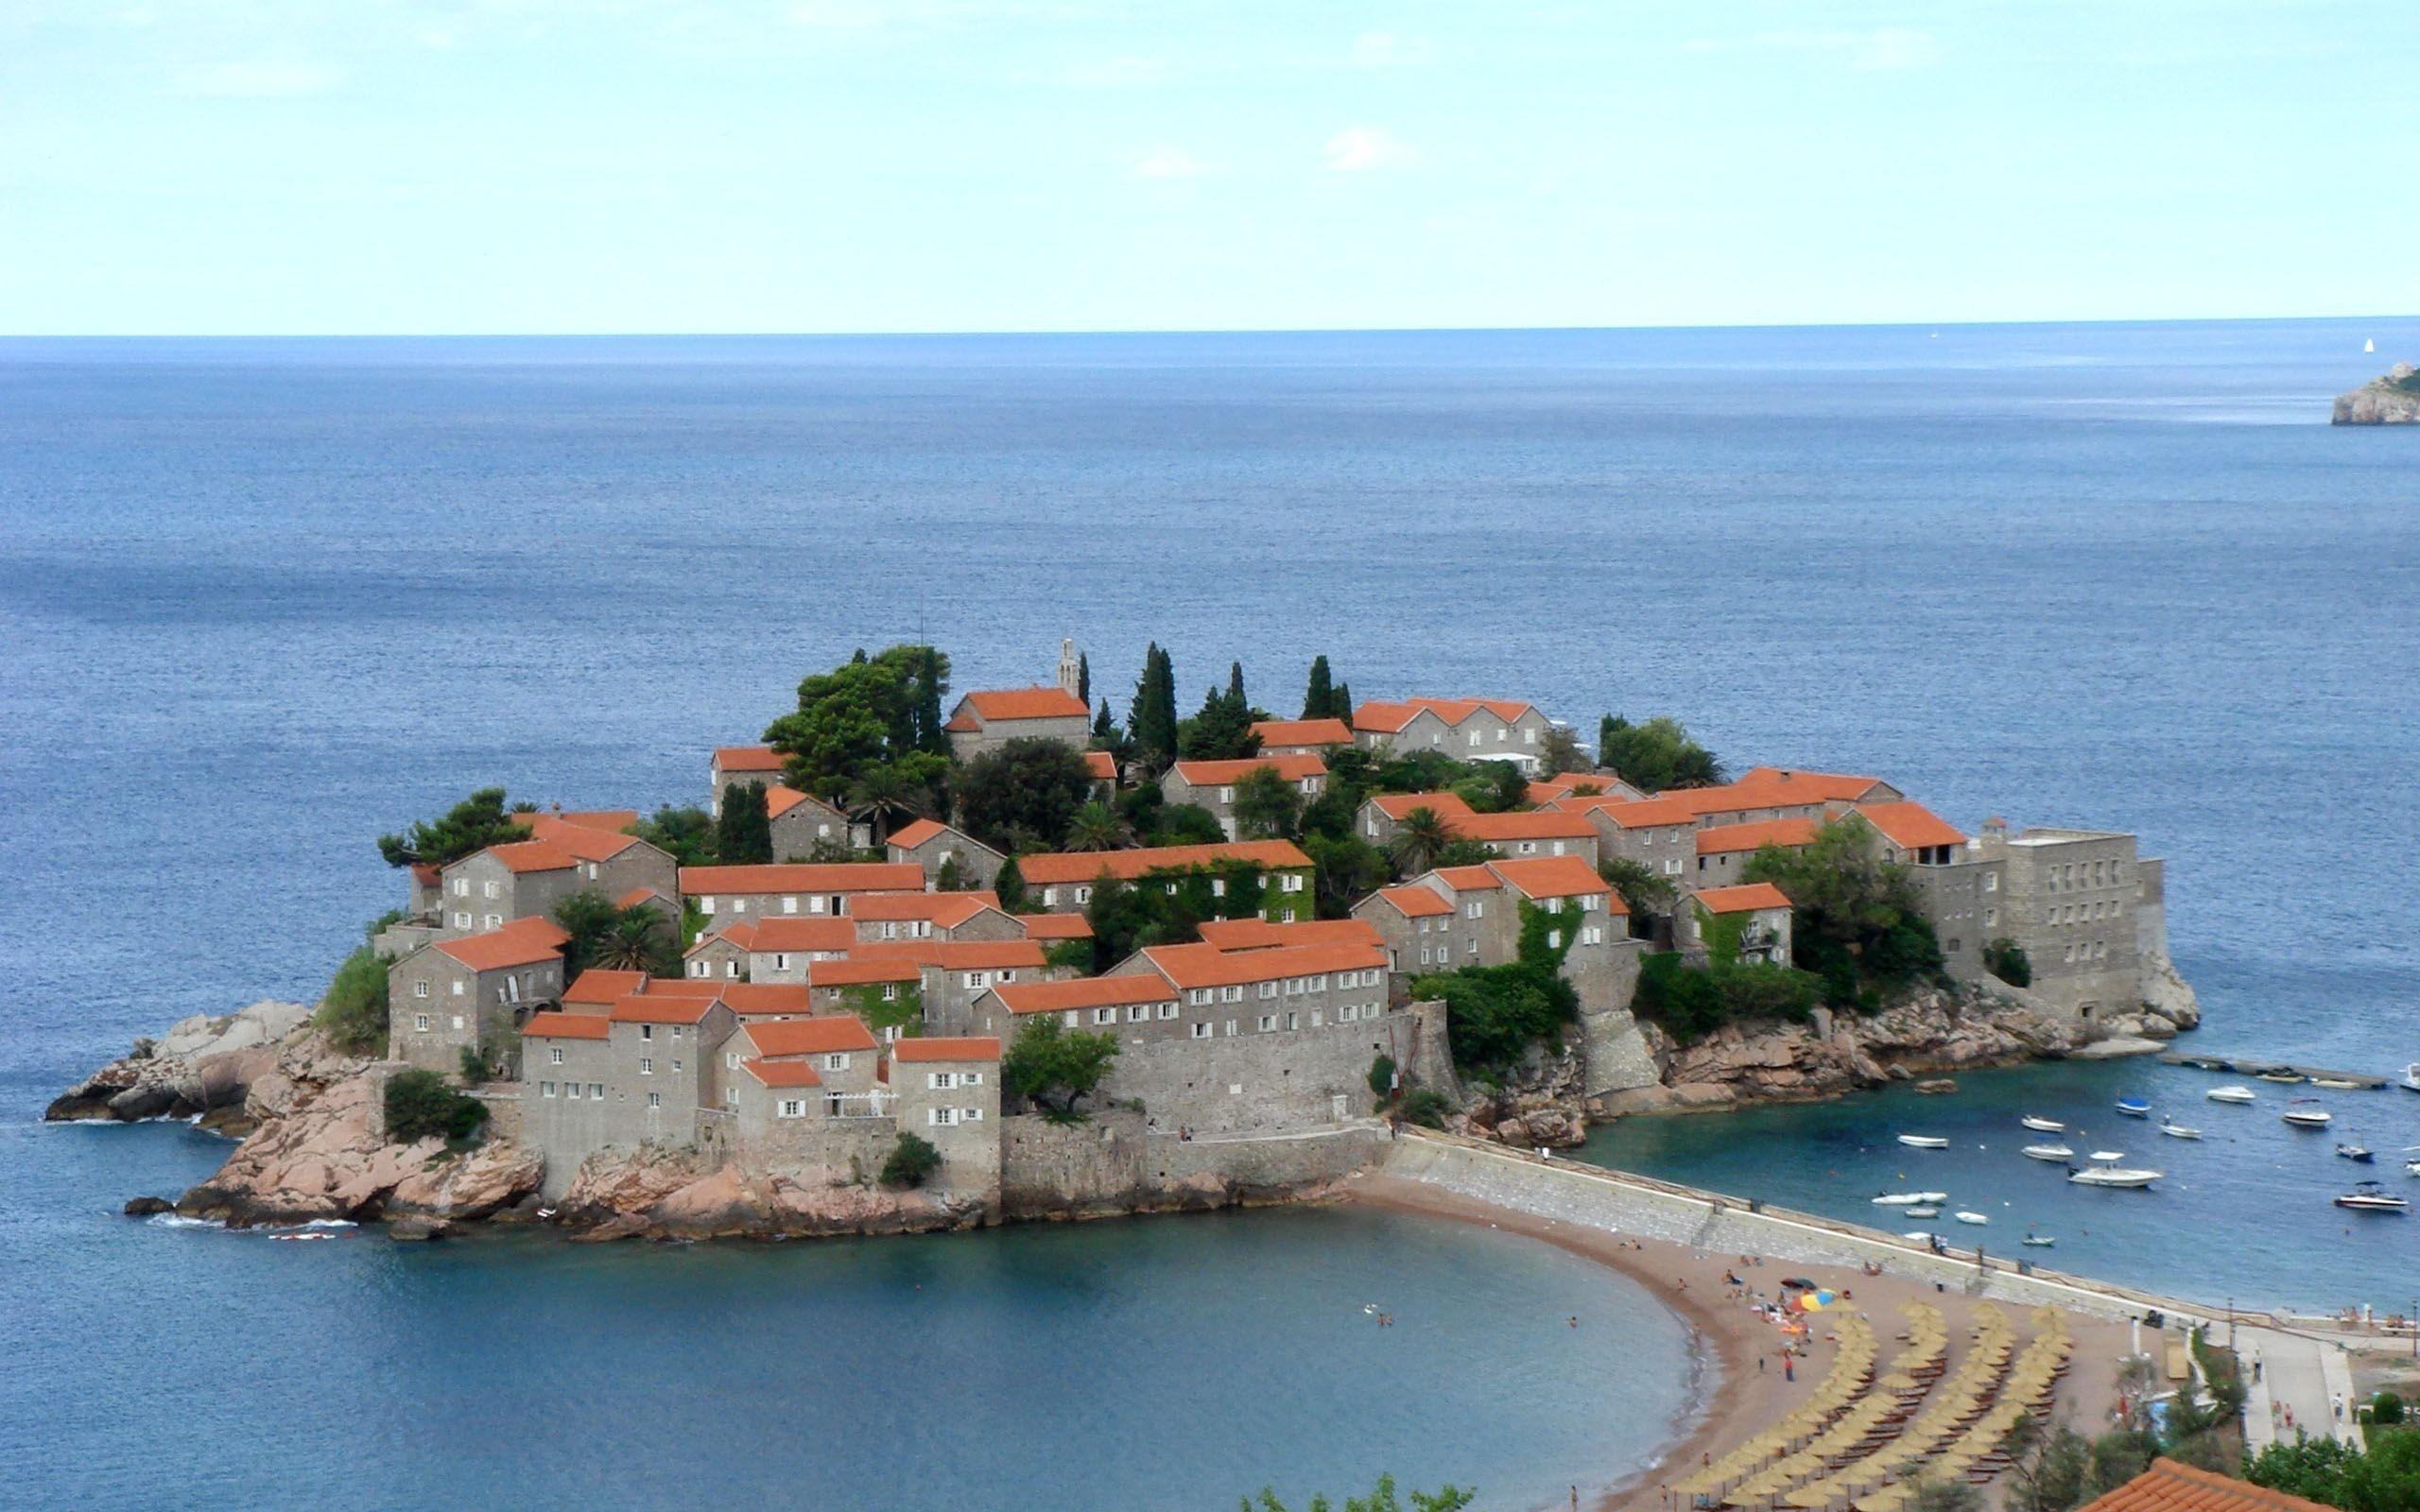 Tur ne Ulqin- Budva- Kotorr